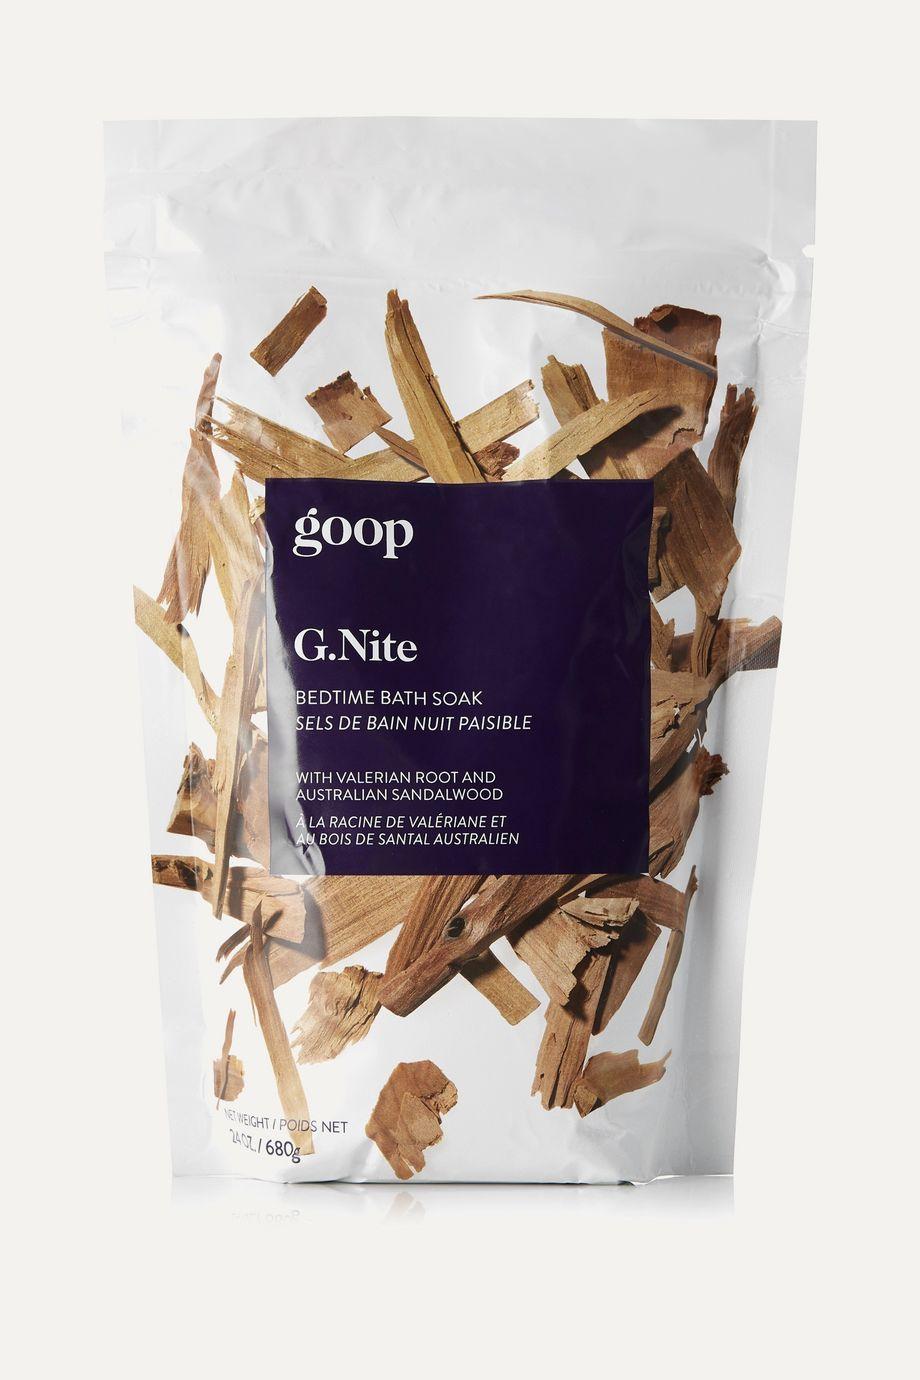 goop G.Nite Bath Soak, 680g